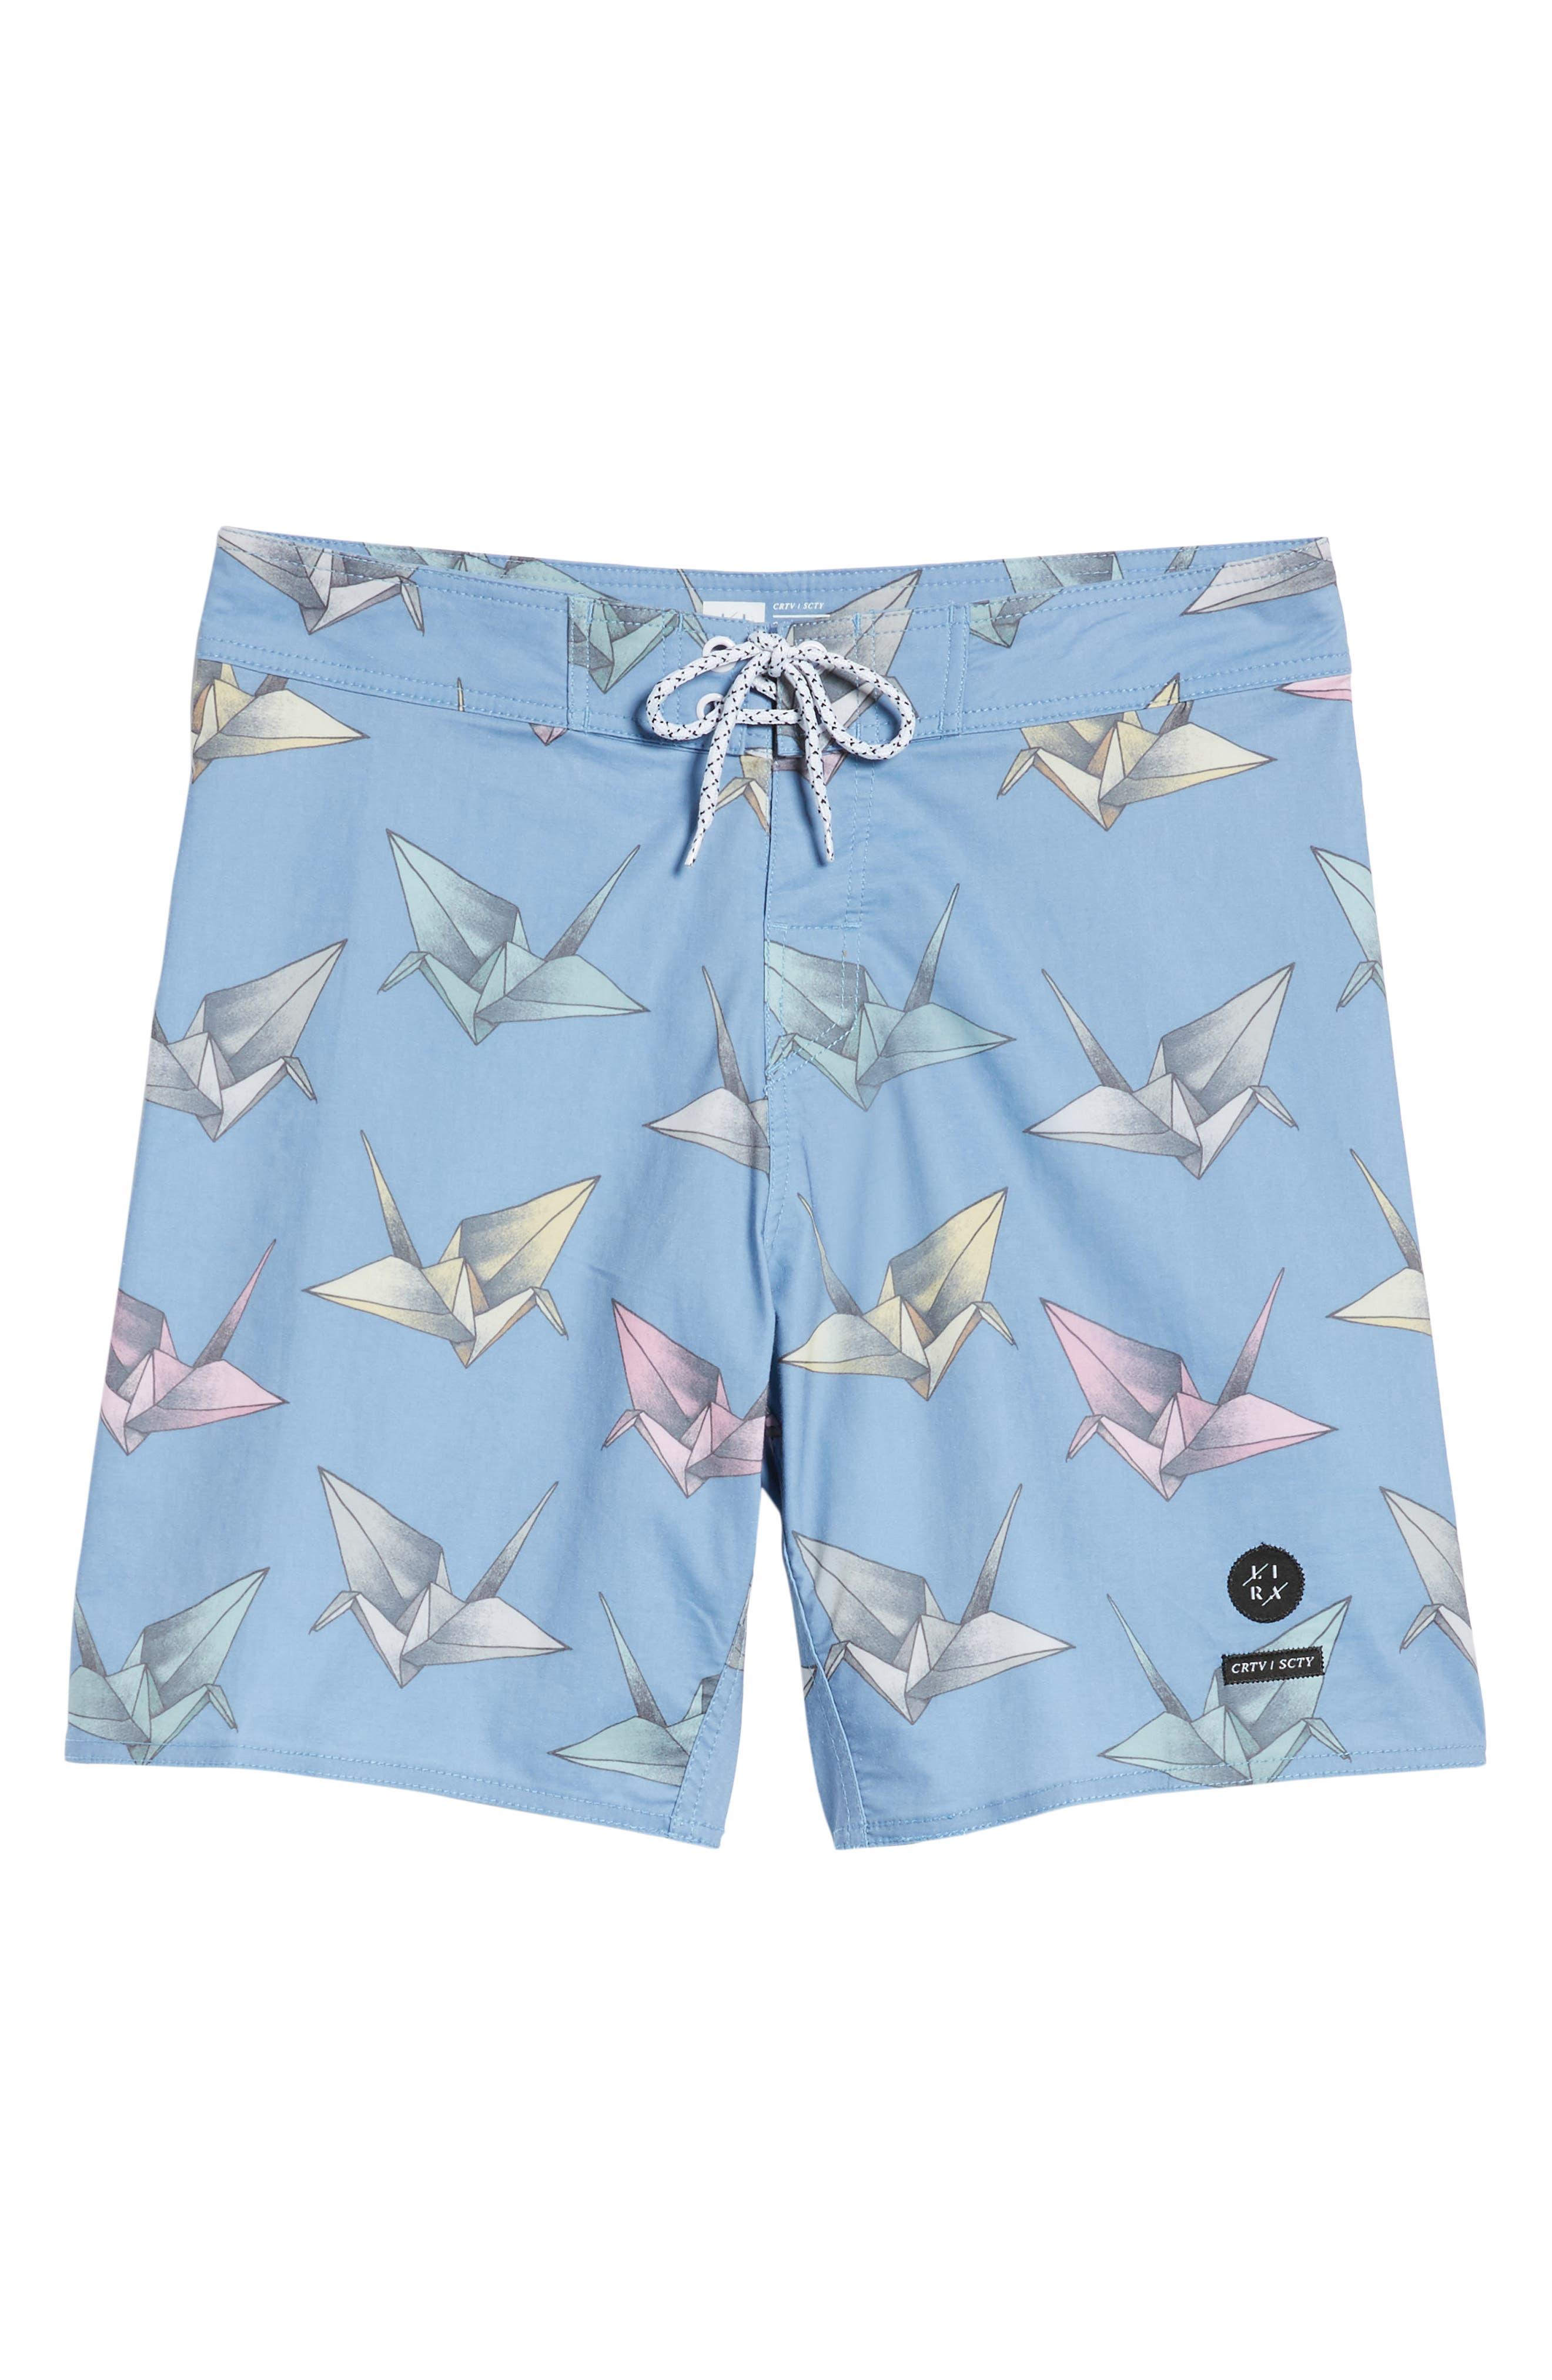 Origami Print Board Shorts,                             Alternate thumbnail 6, color,